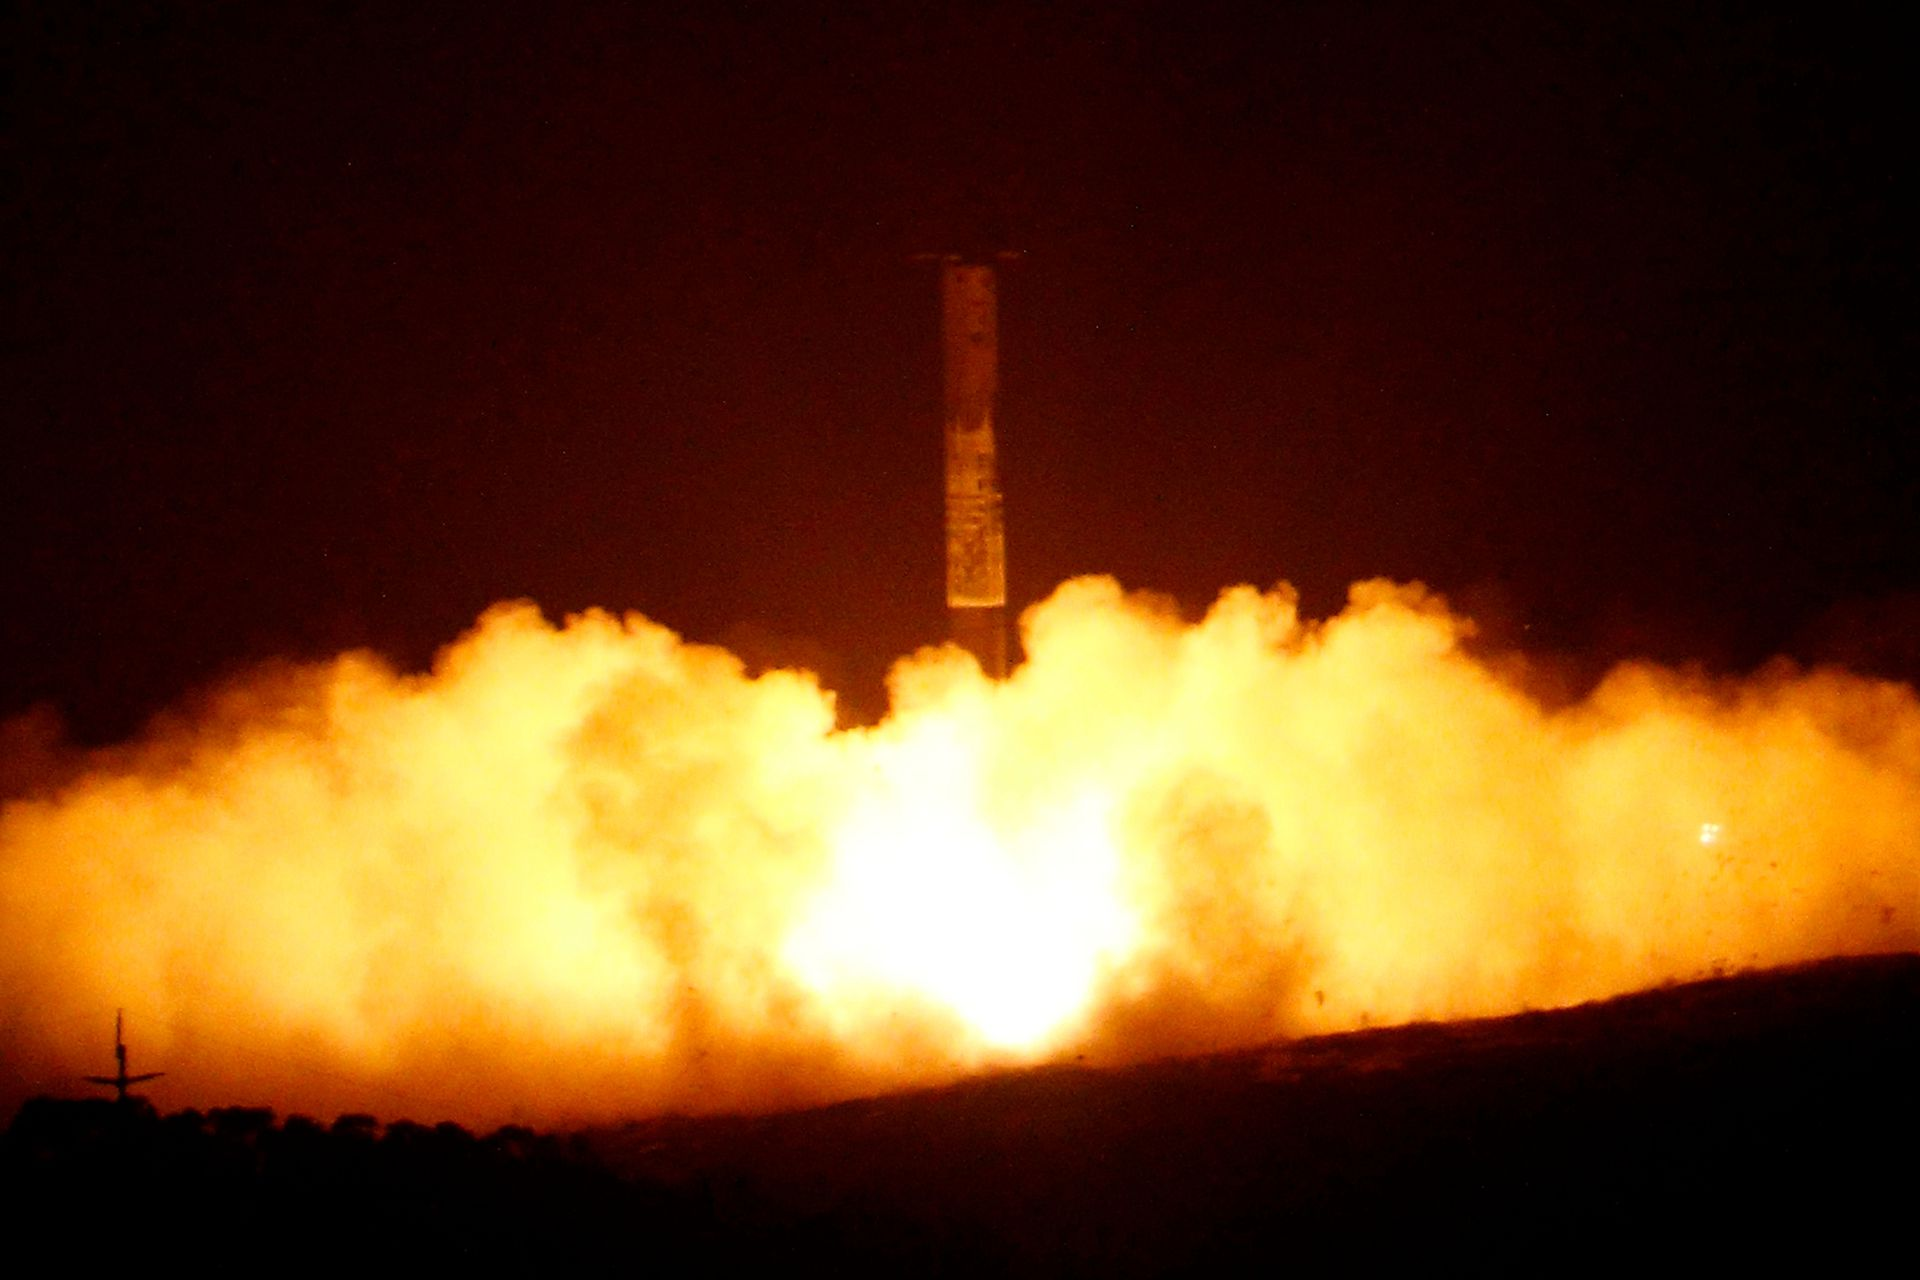 ya está órbita nuevo satélite argentino Saocom 1A